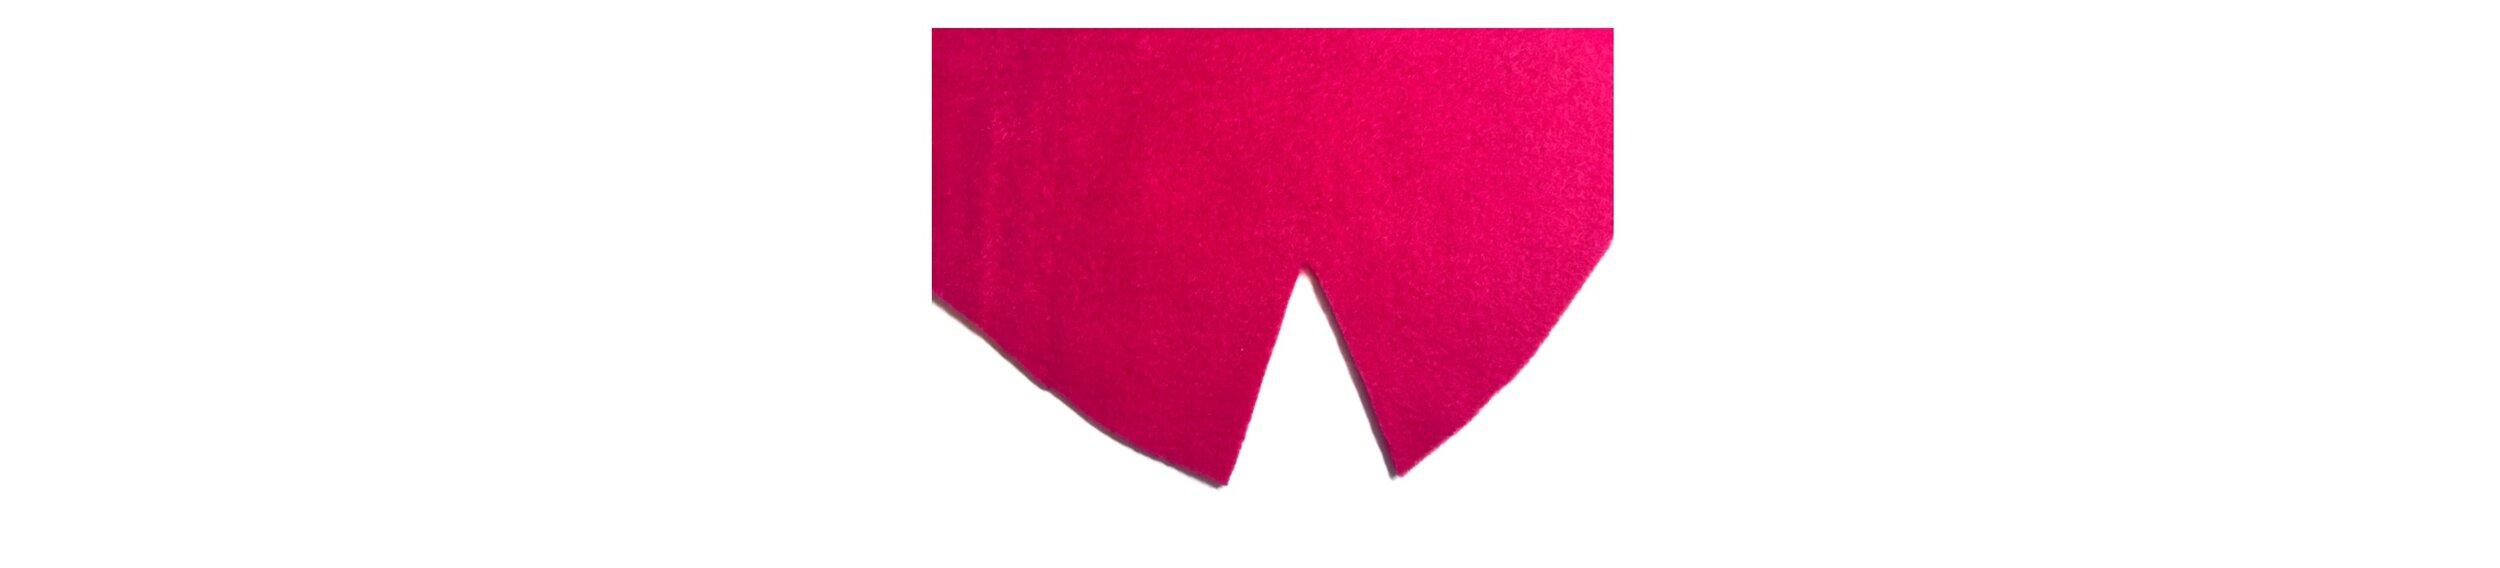 Cut the dart when cutting the fabric